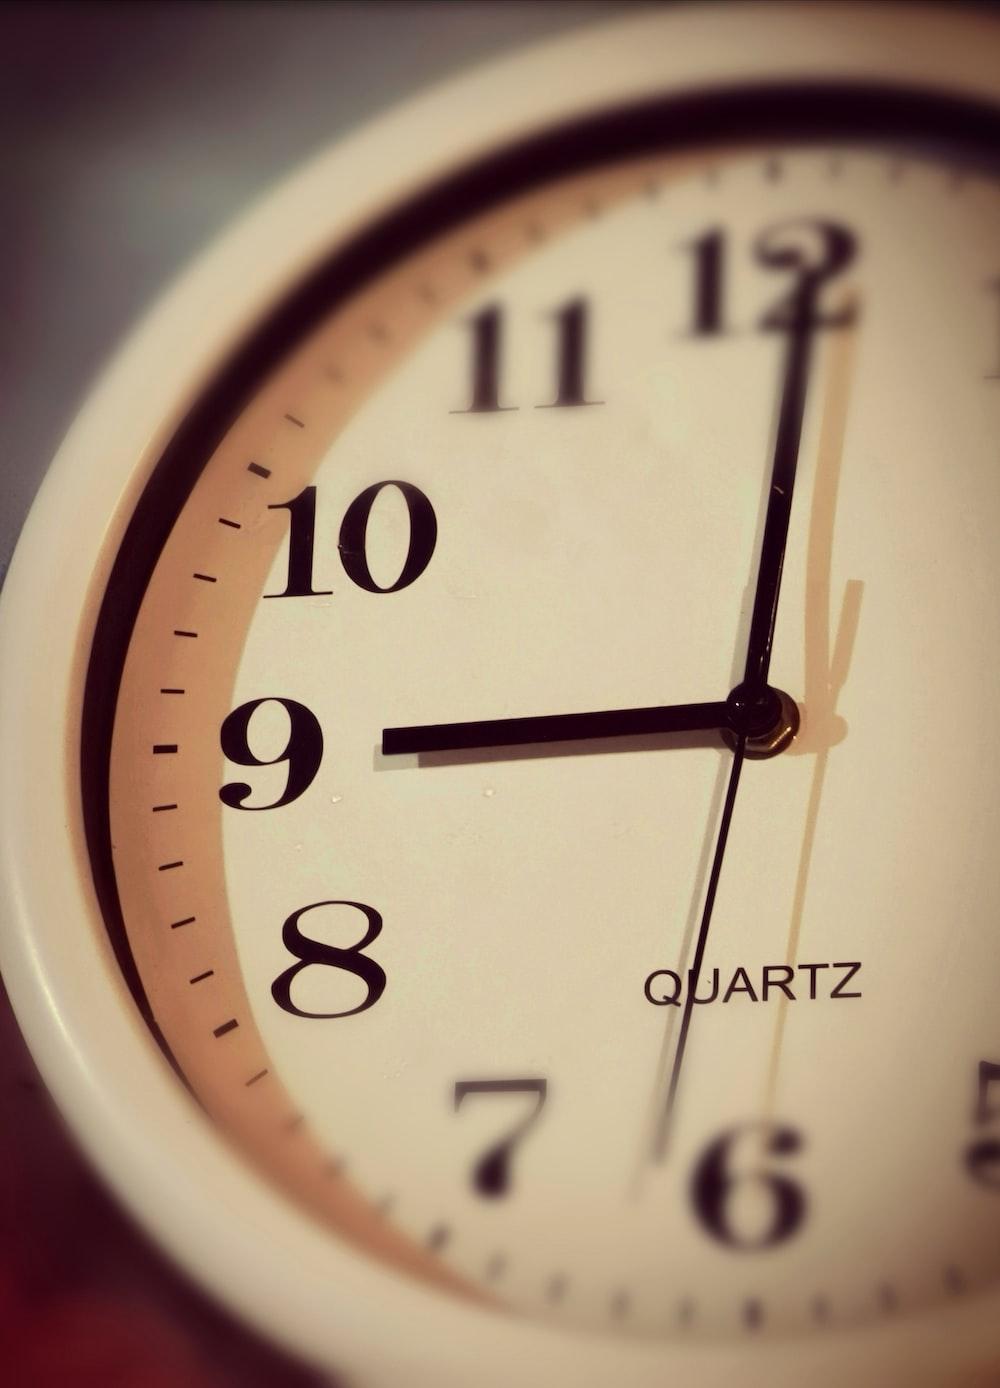 white and brown analog clock